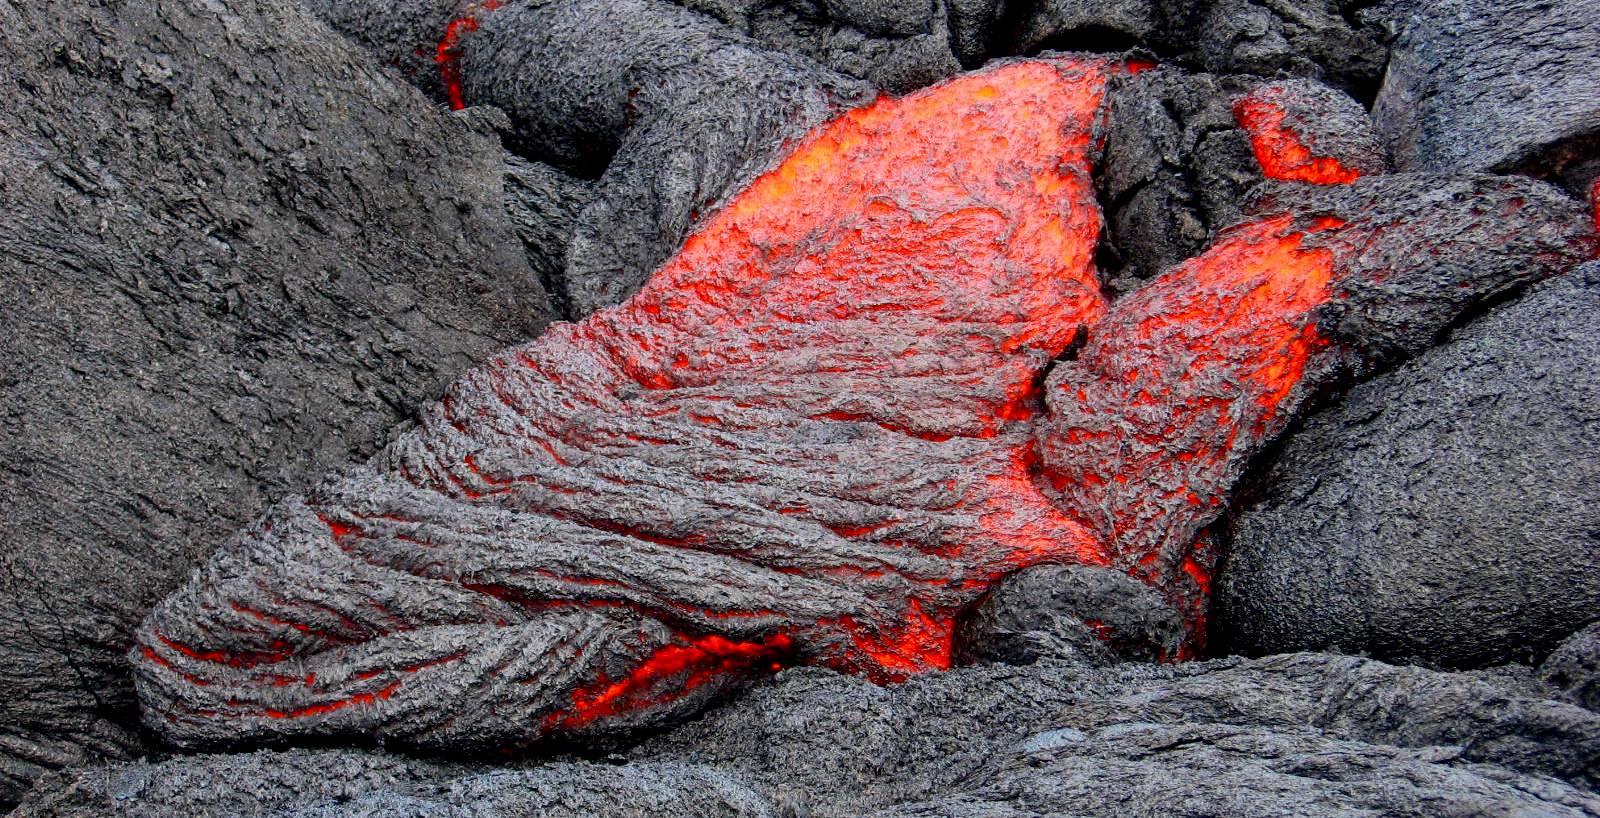 hight resolution of figure 3 3 magma forming pahoehoe basalt at kilauea volcano hawaii se